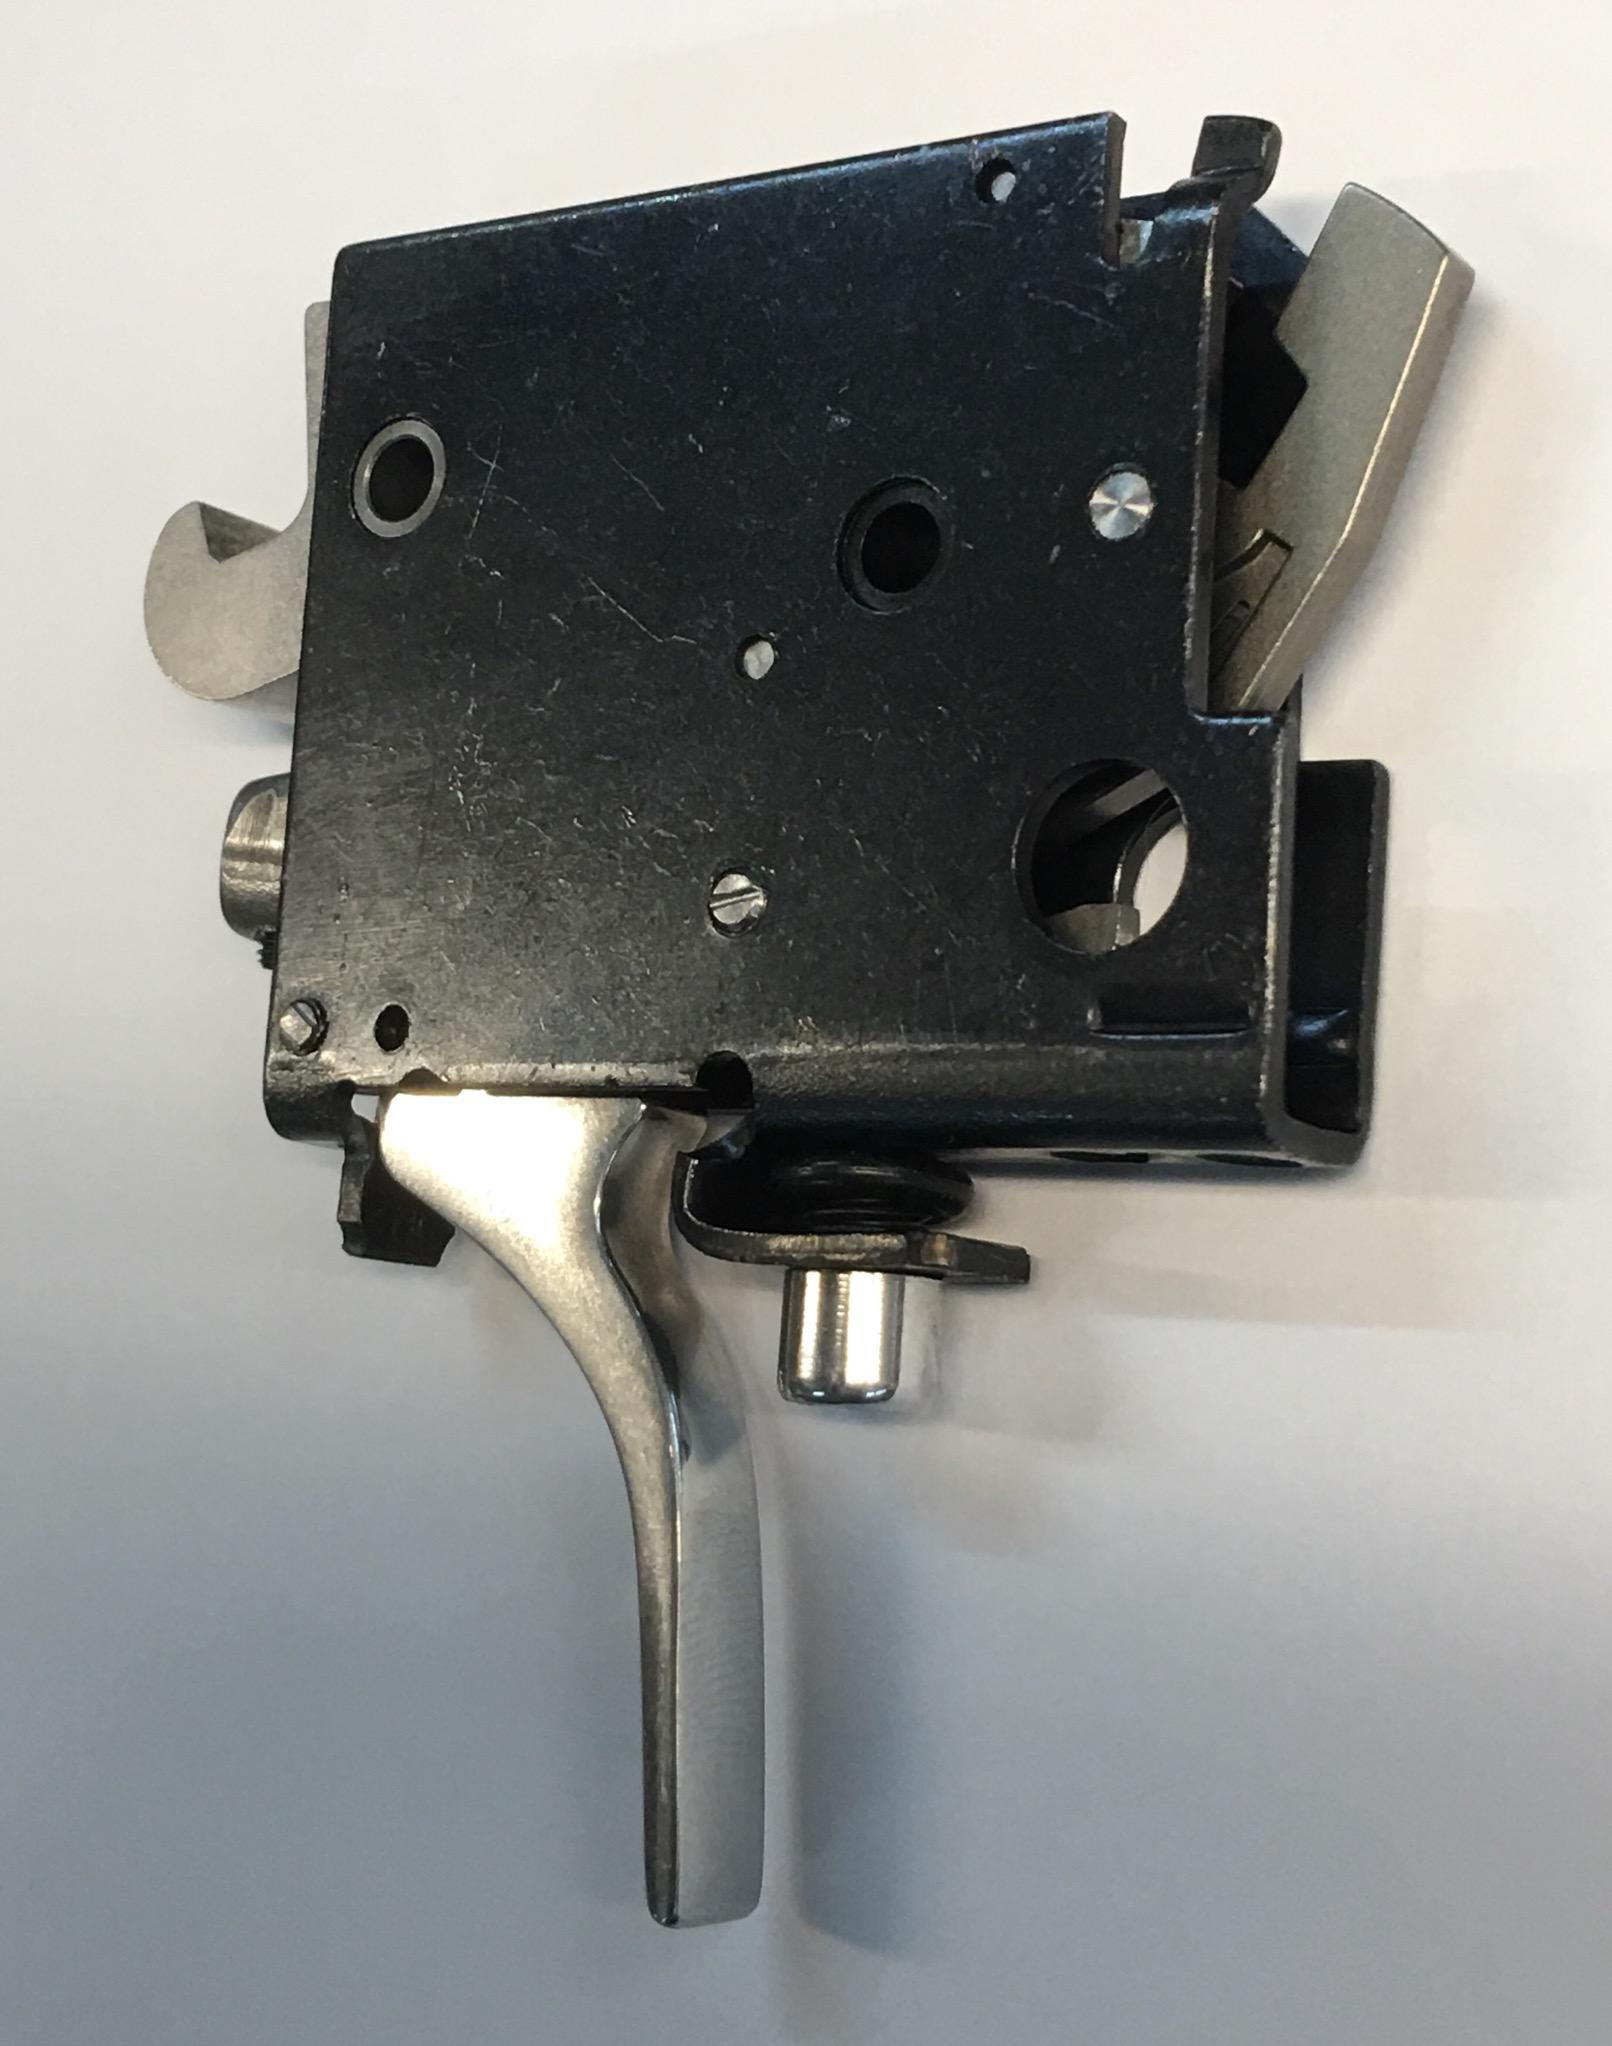 V-Mach getuntes Abzugssystem, rechts